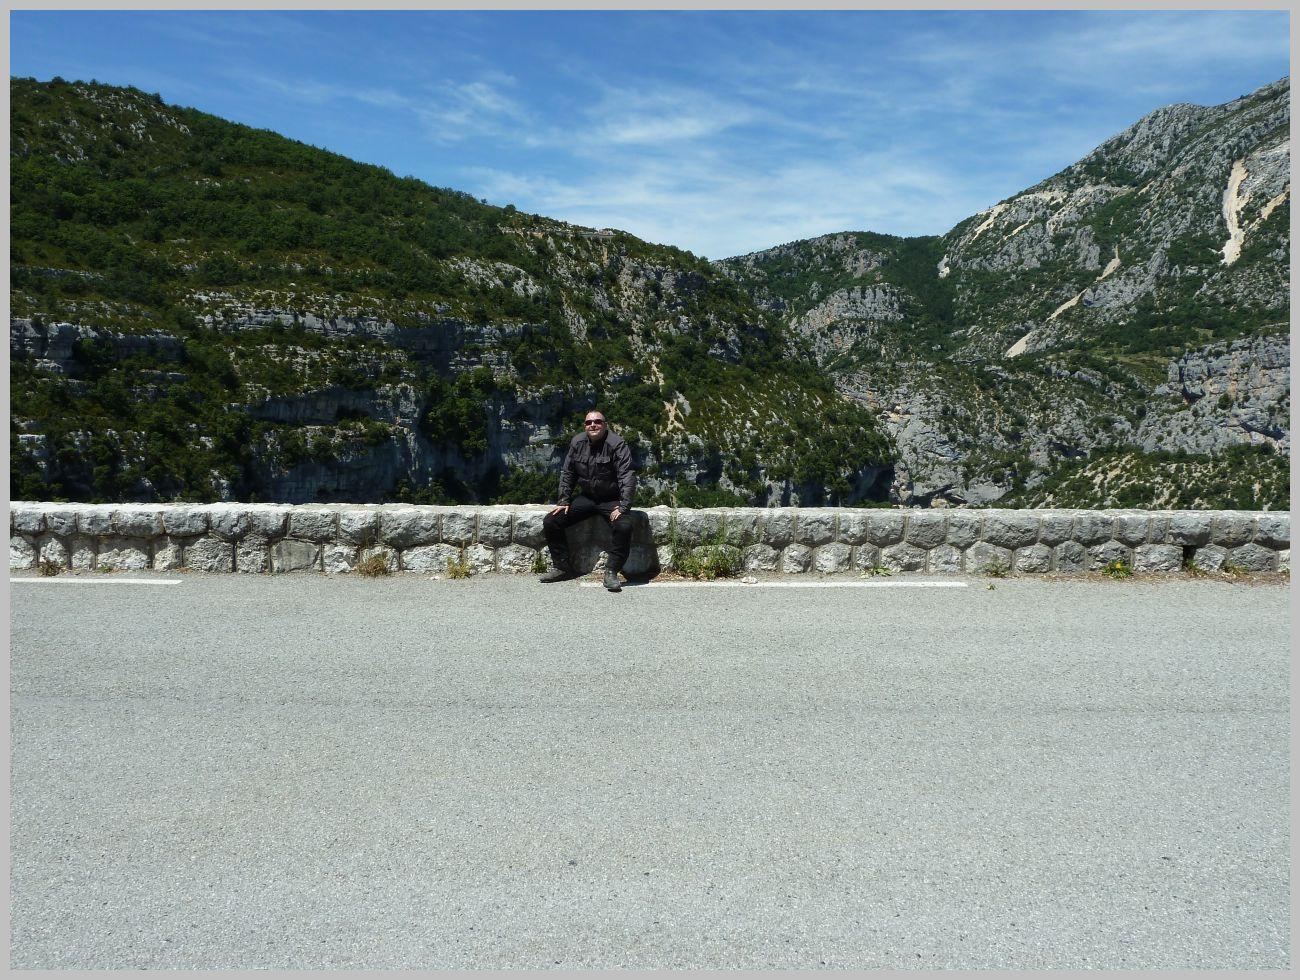 201206_Korsika_Moped094